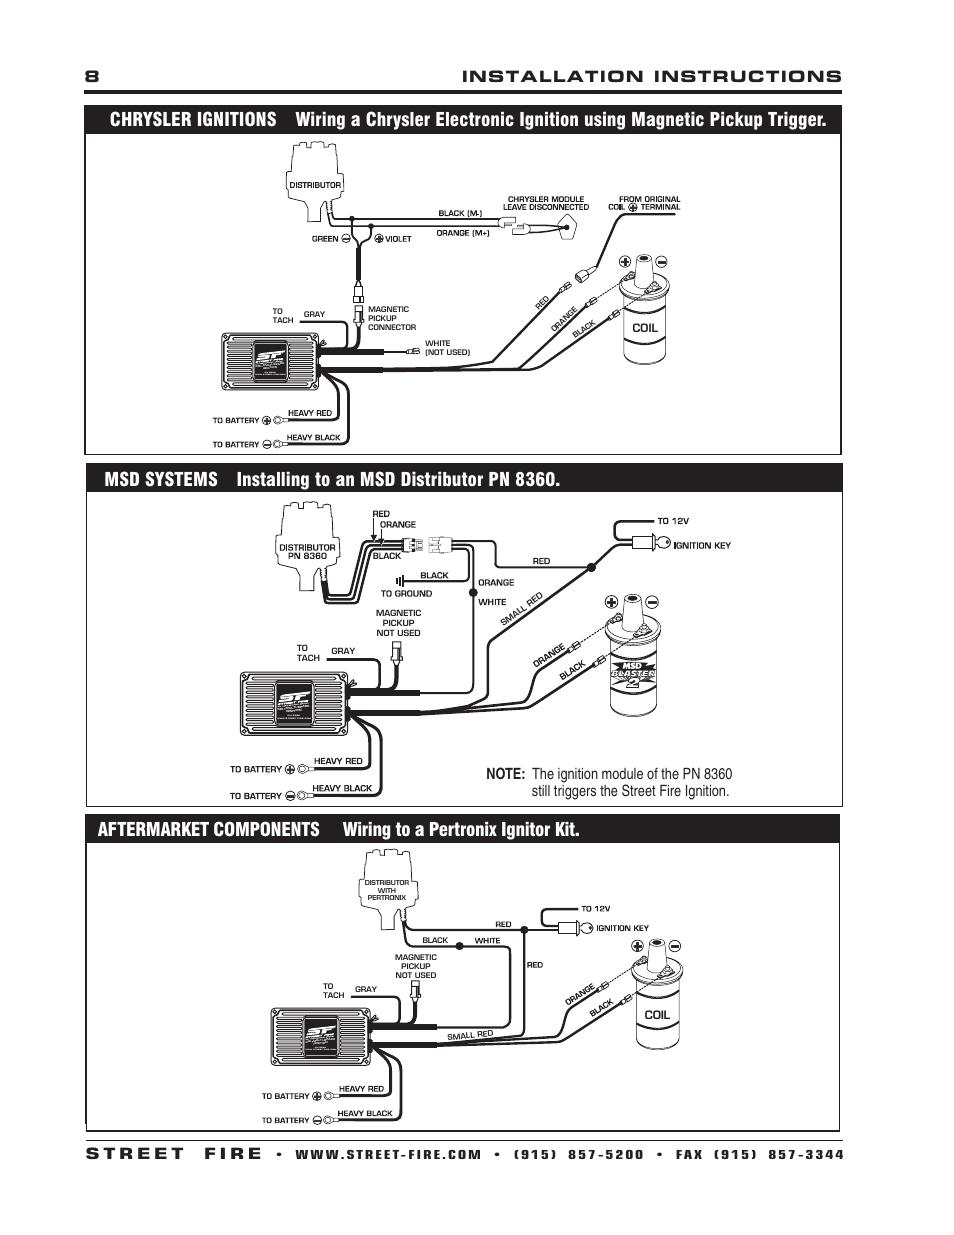 Fantastic Apexi Avc R Manual Frieze - Wiring Diagram Ideas ...